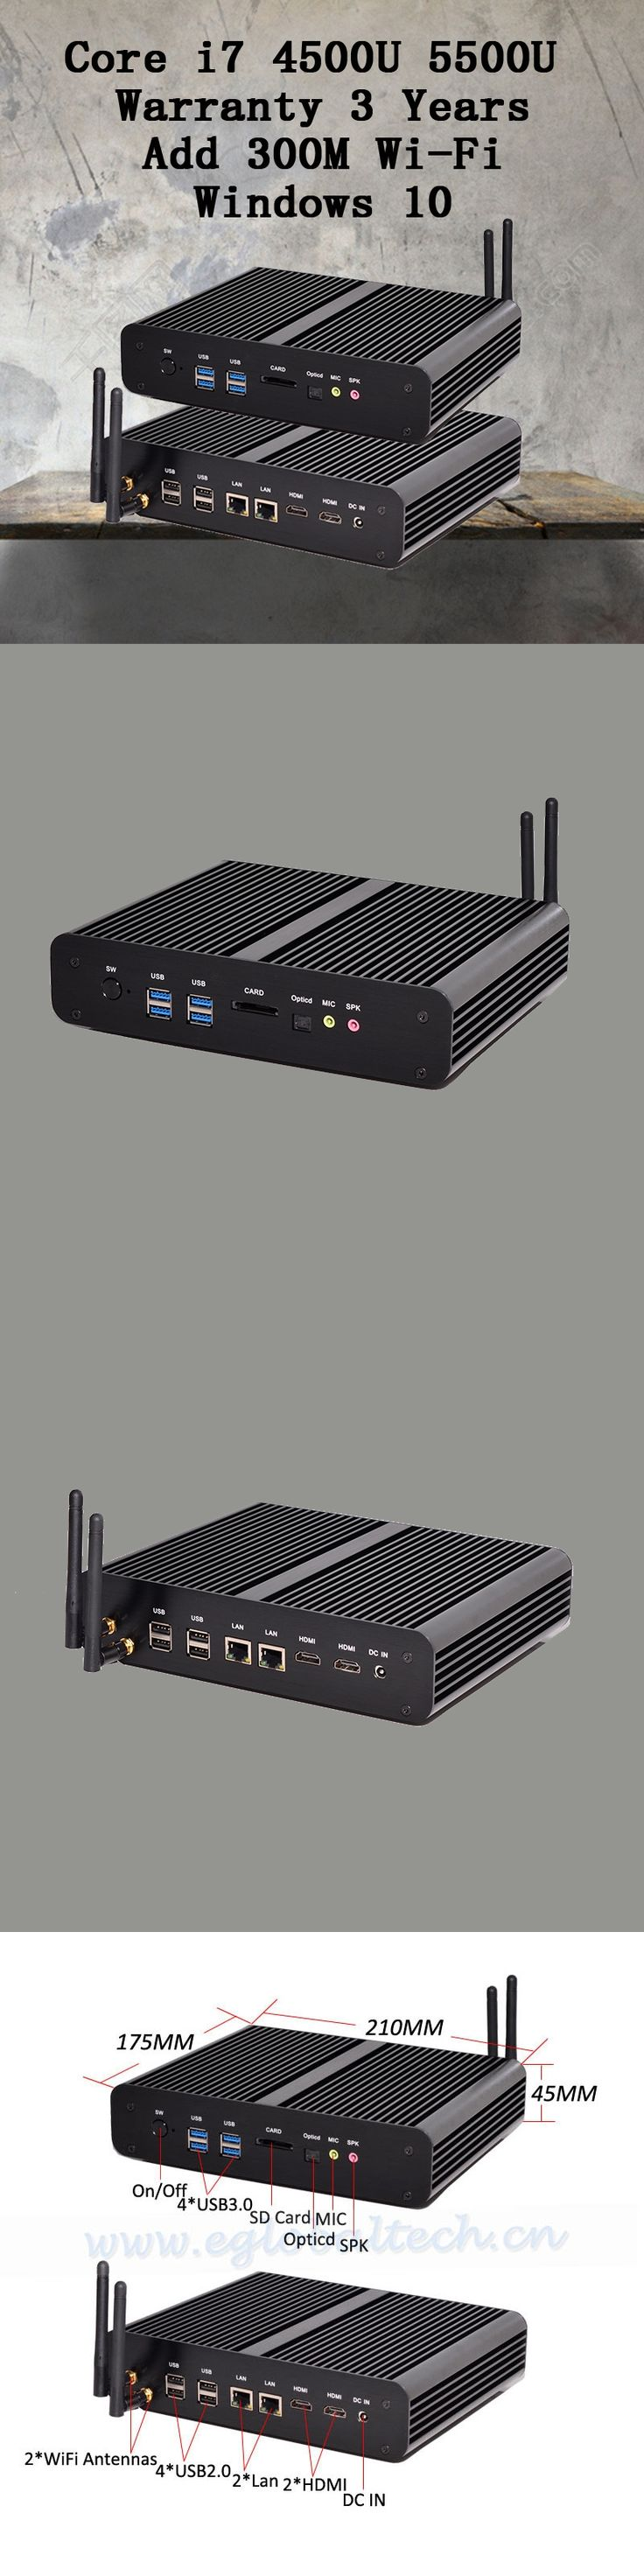 Mini PC Graphique HD 5500 Windows HDMI Carte 4 K HTPC Mini-Itx Micro Intel Core i7 5500U mini computer 16G RAM best combination